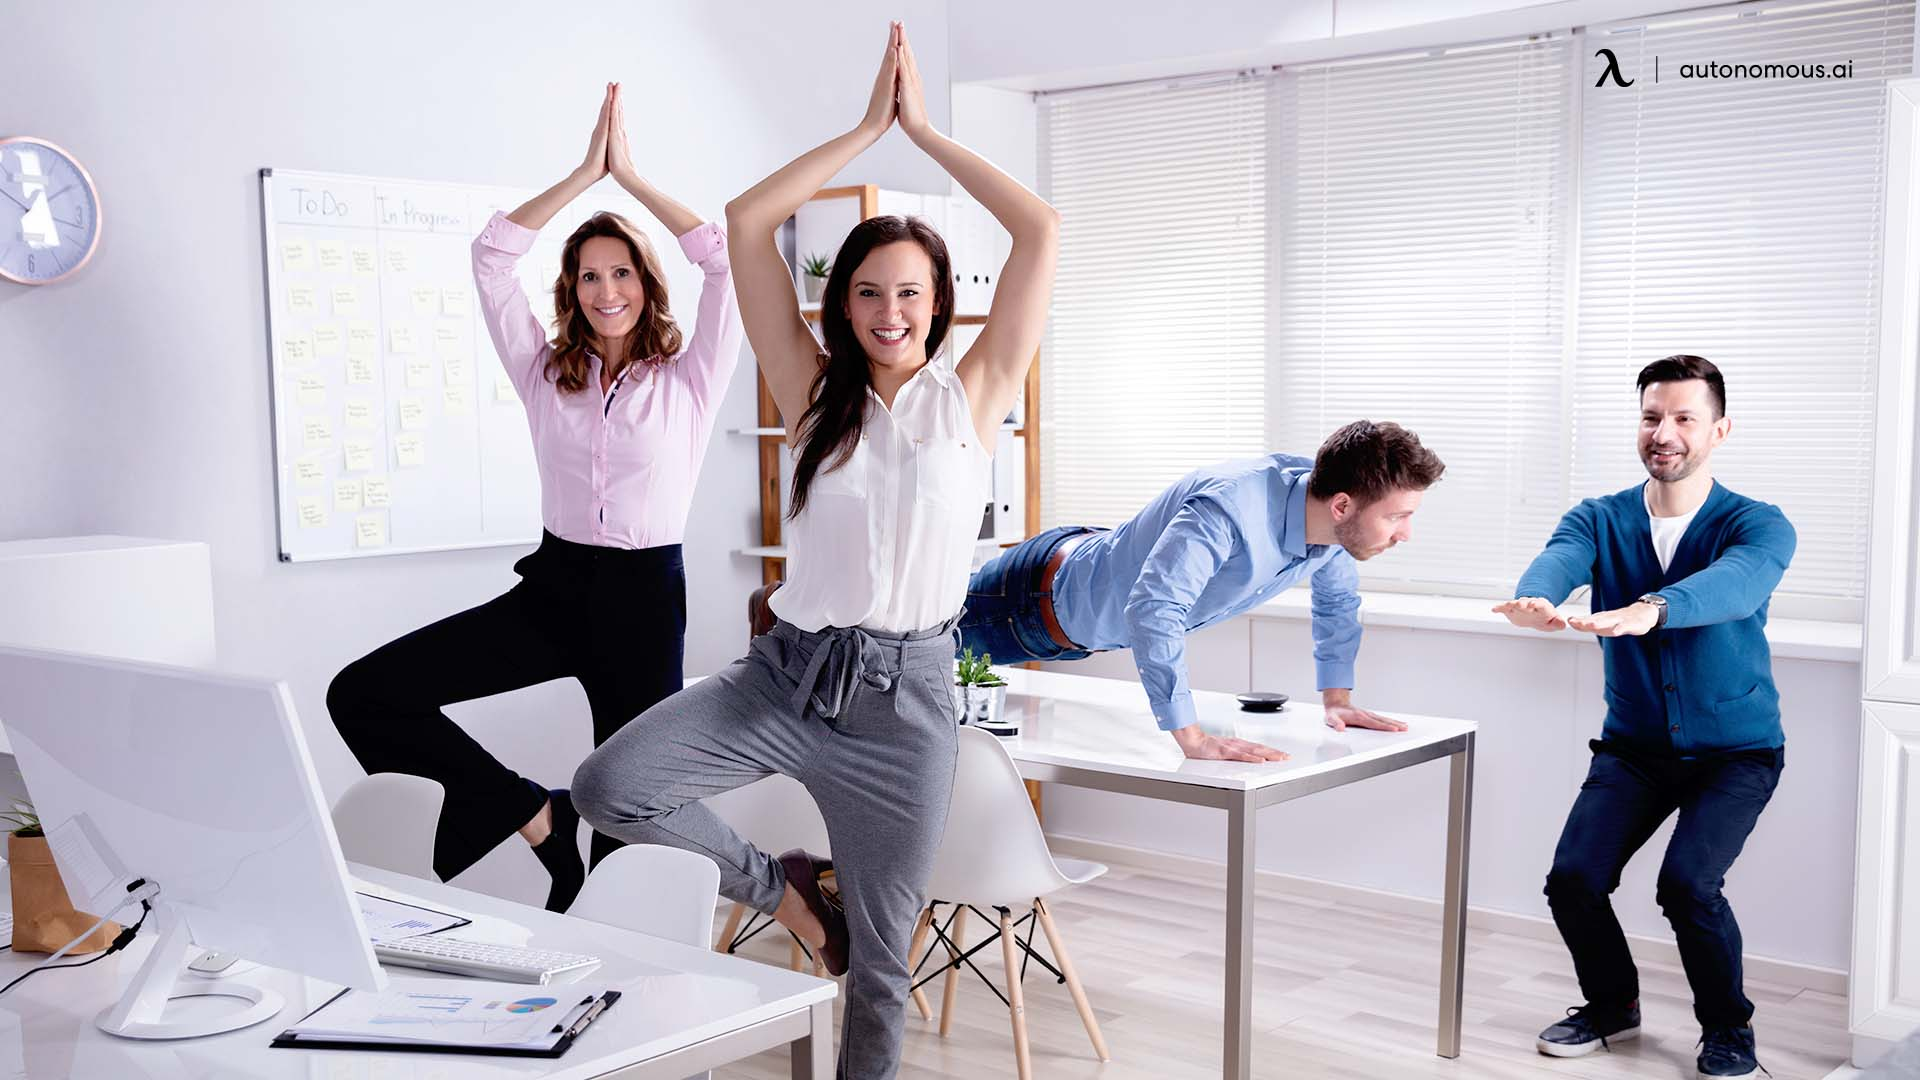 Hybrid Working Puts Employees